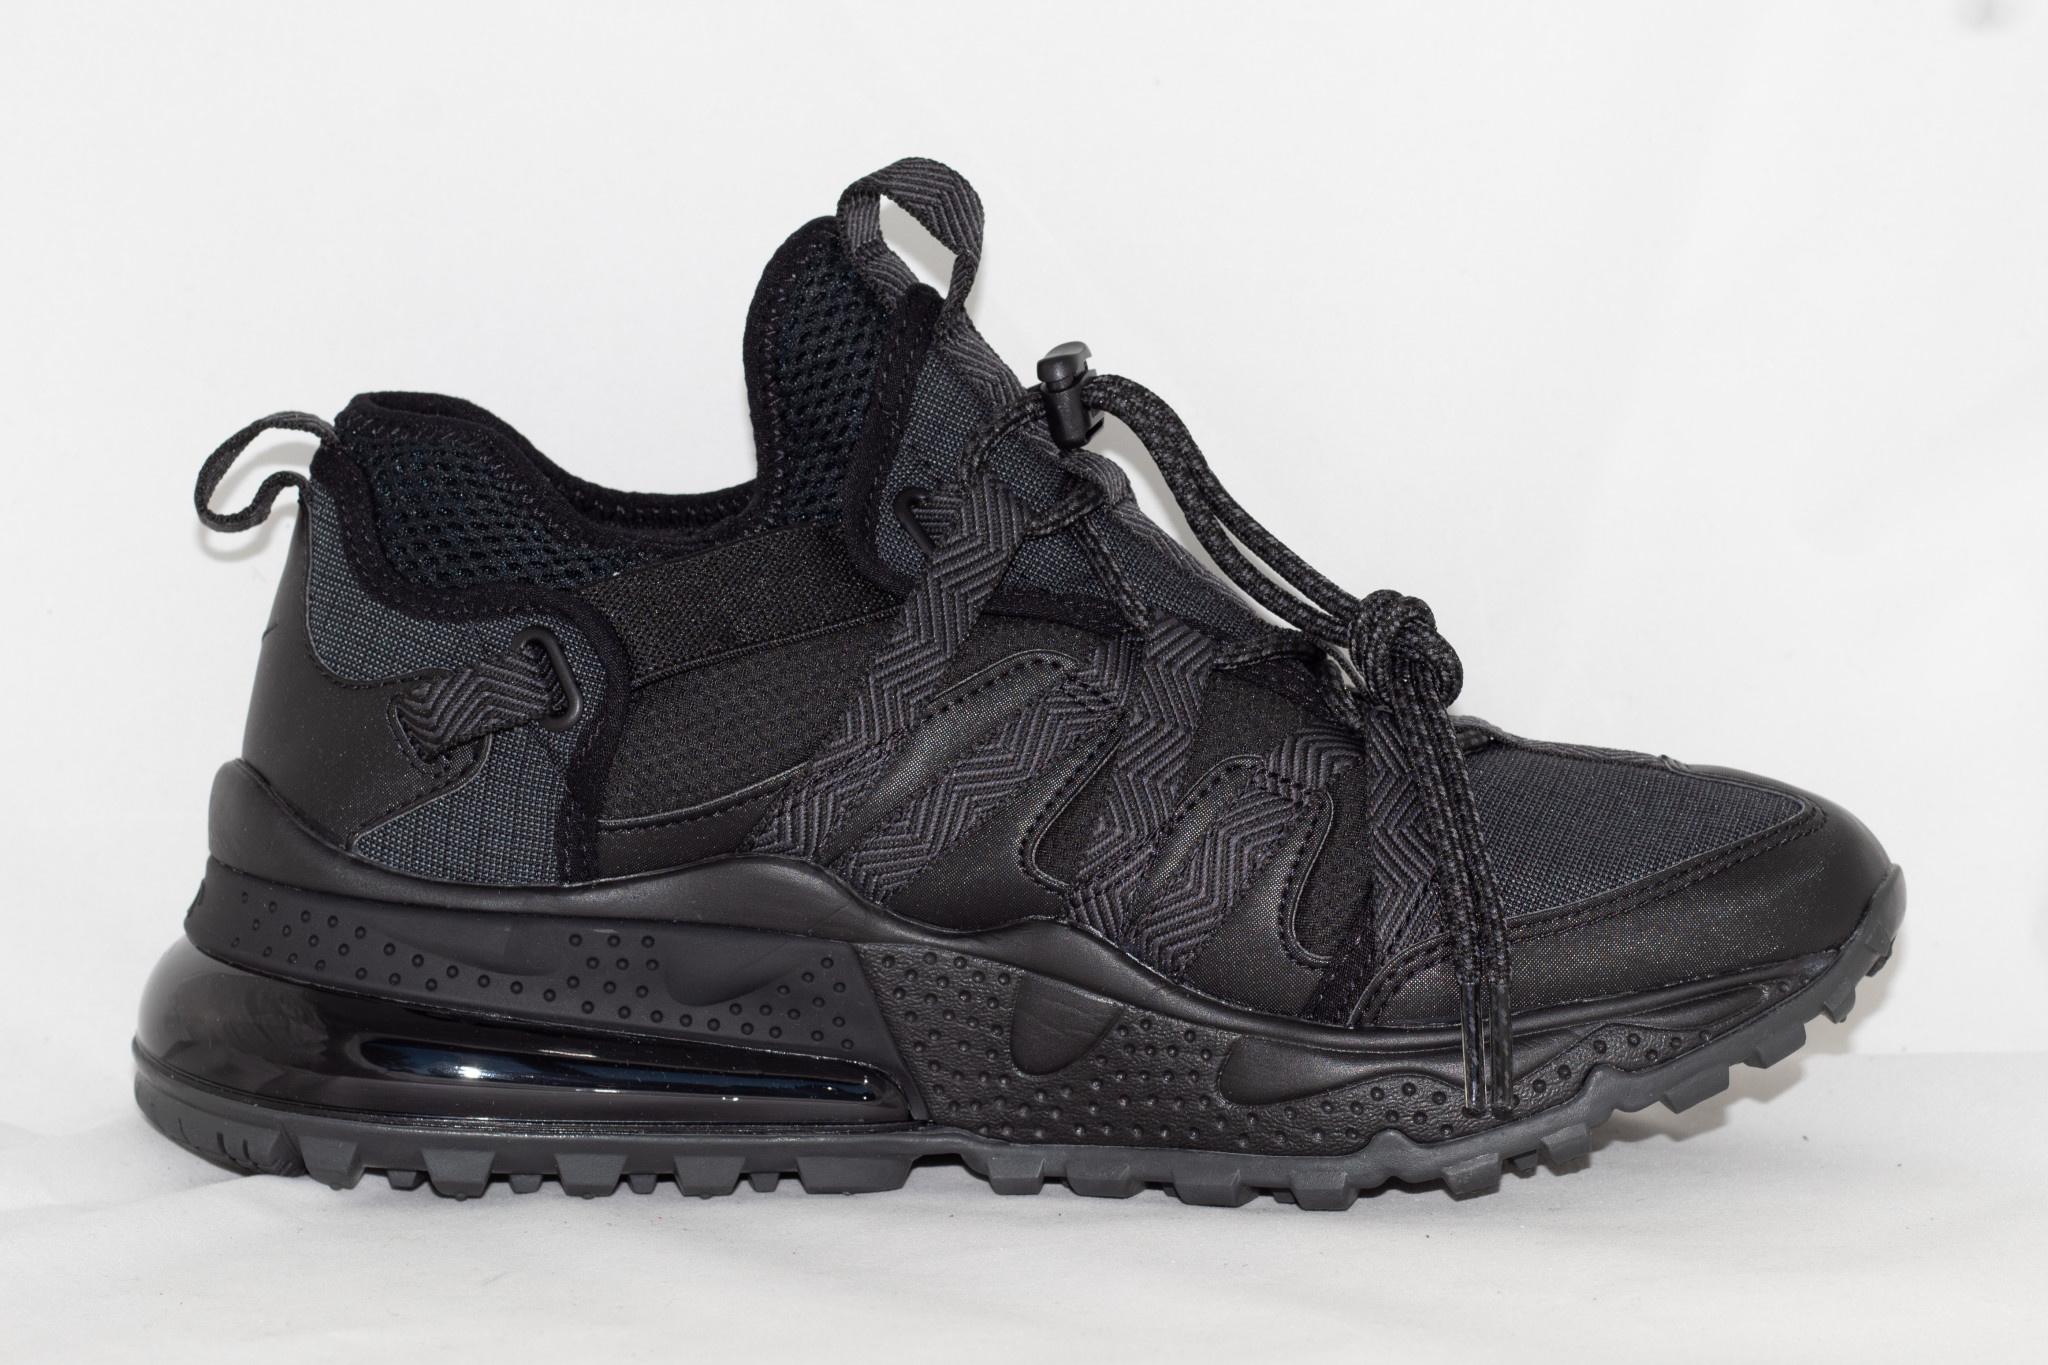 Nike M NIKE AIR MAX 270 BOWFIN Black/ Anthracite- Black